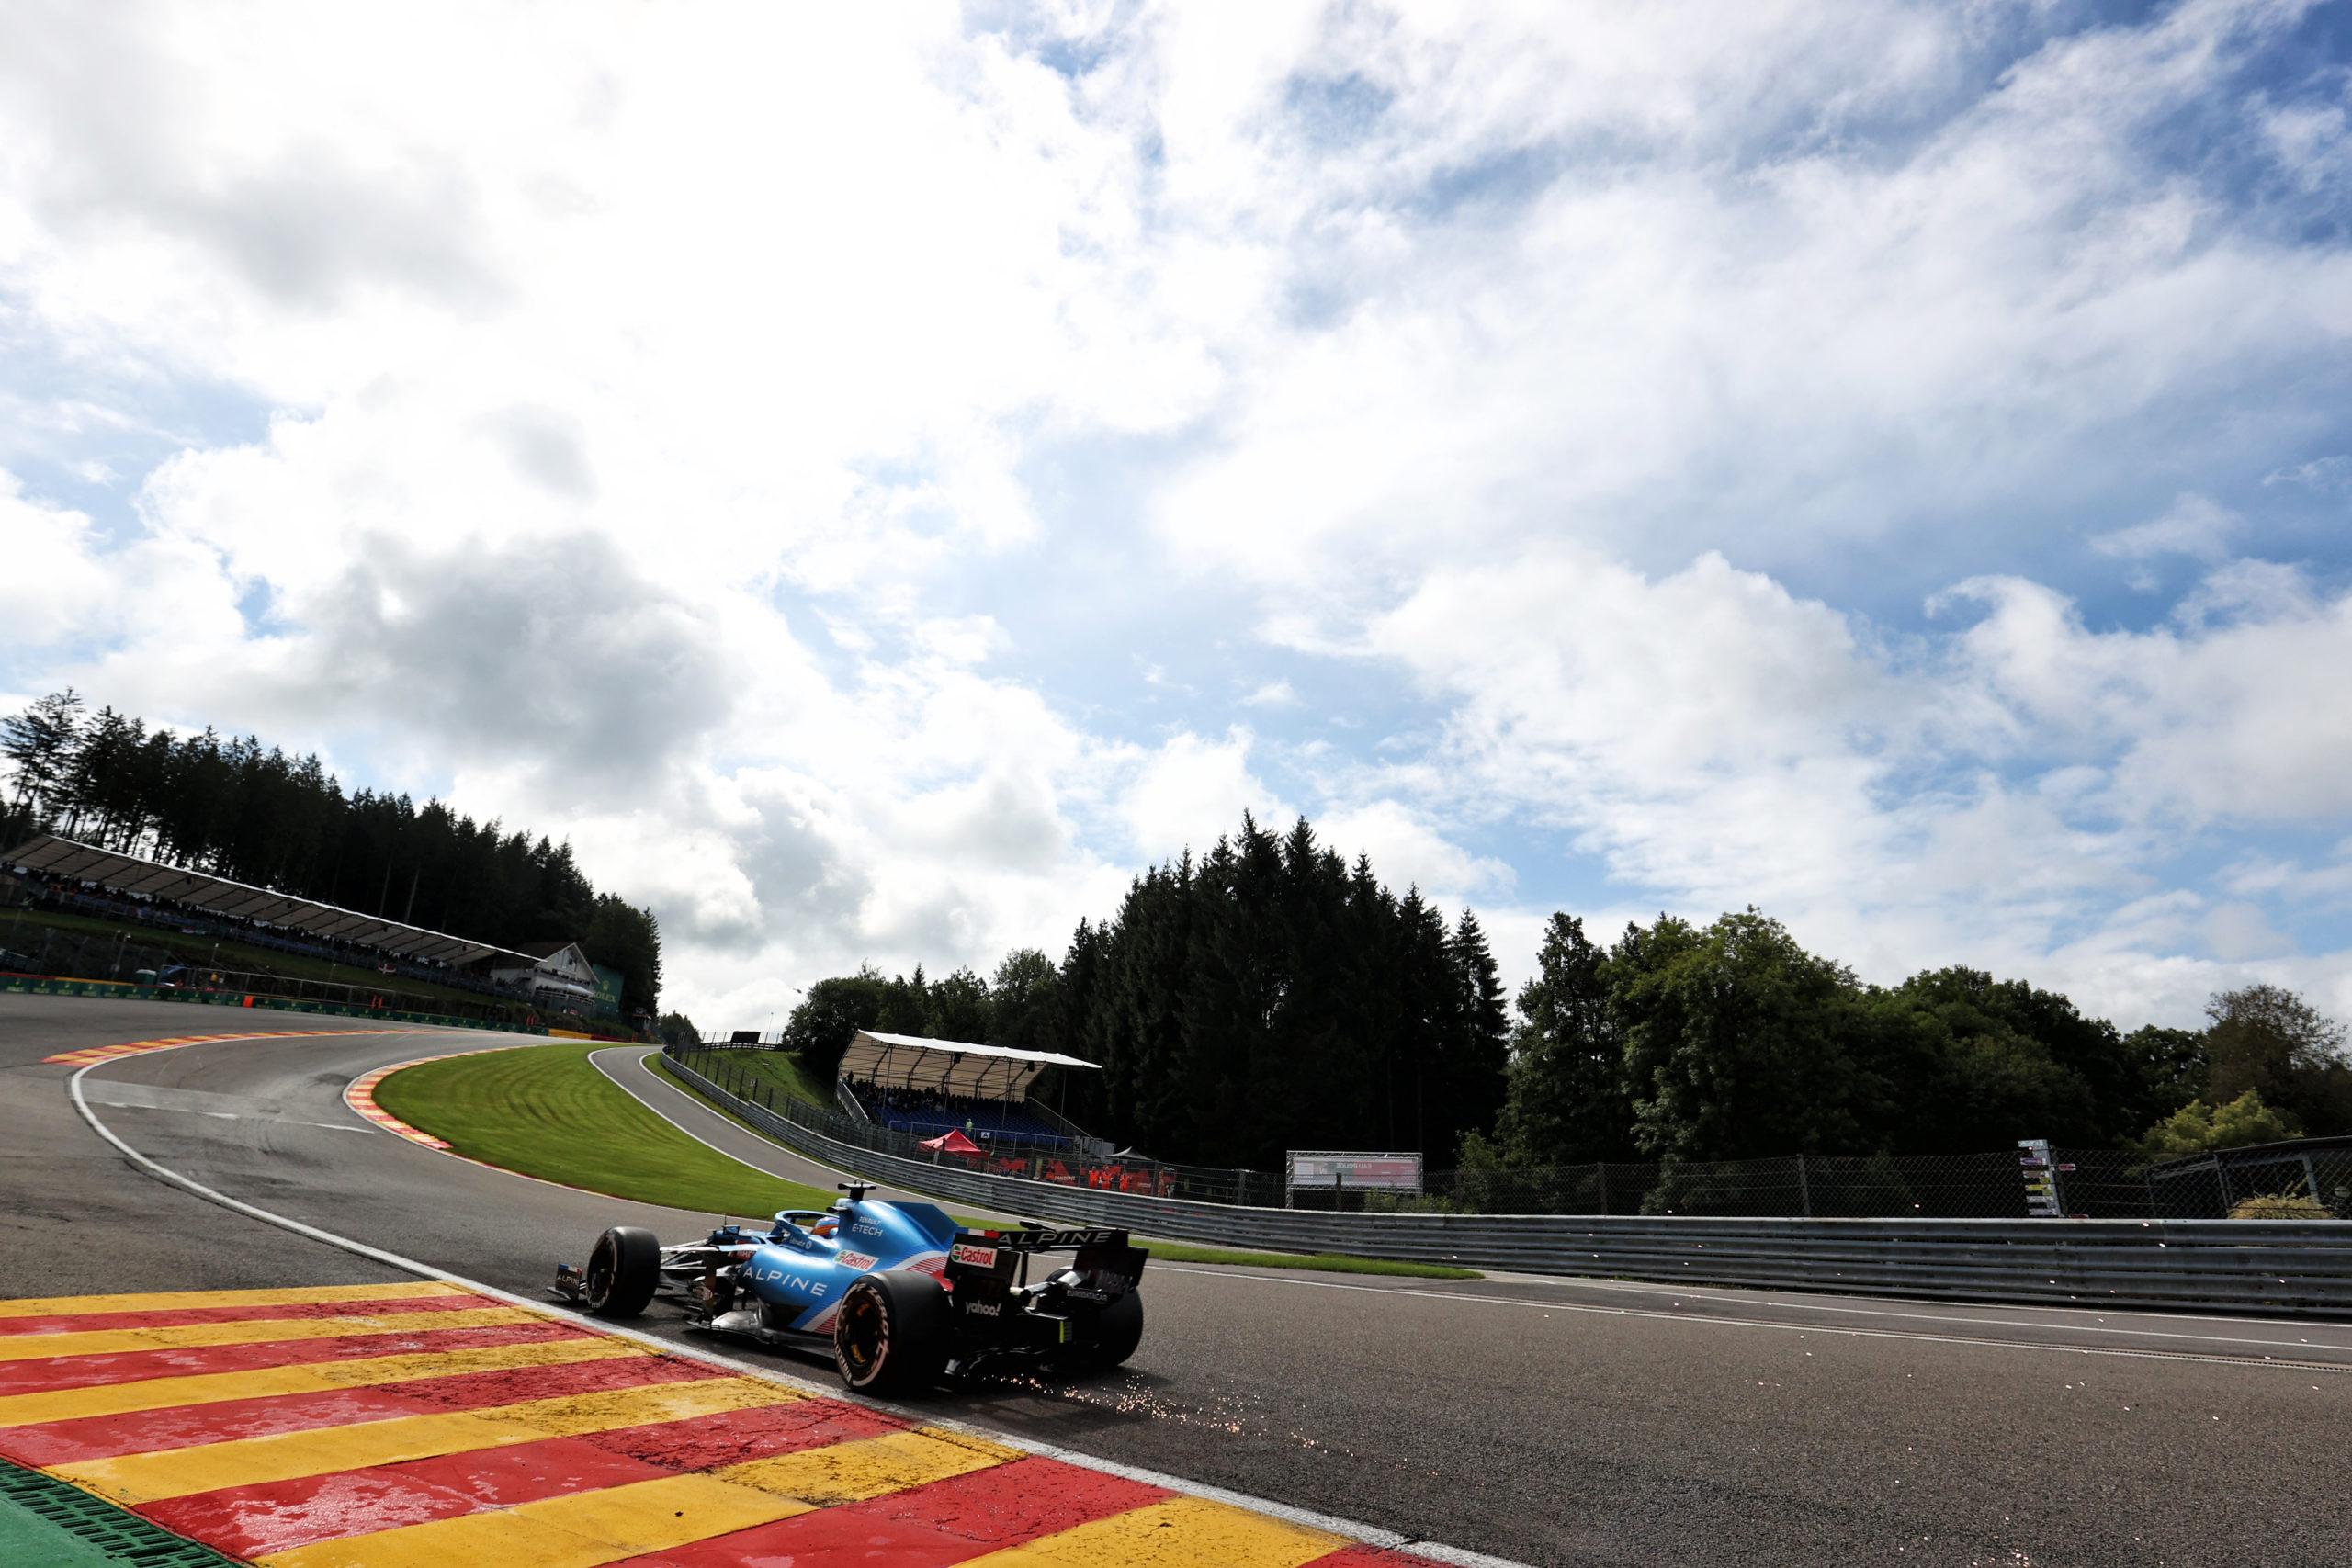 Fernando Alonso (ESP) , Alpine F1 Team A521, F1 Grand Prix of Belgium at Spa-Francorchamps, 2021